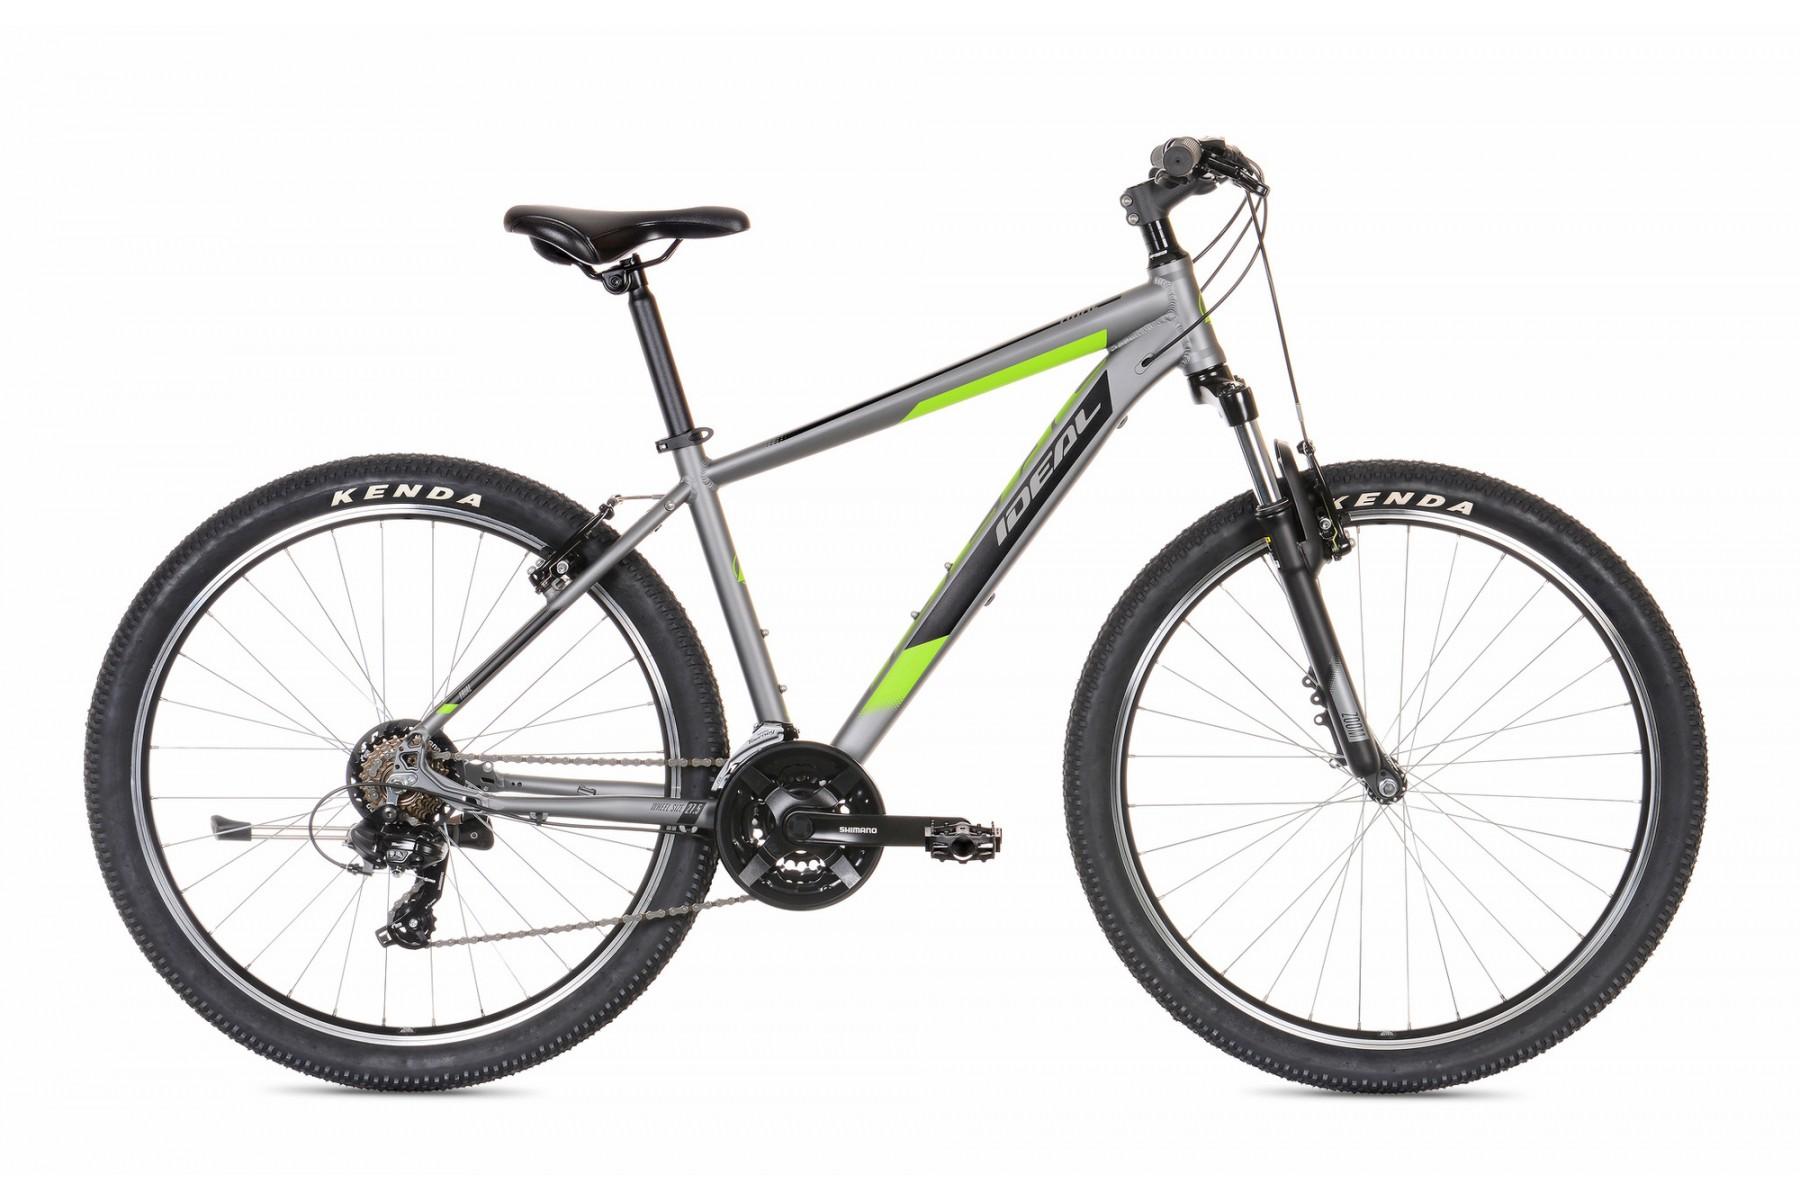 Ideal Orama 427-E10 M Pedelec Bicycle